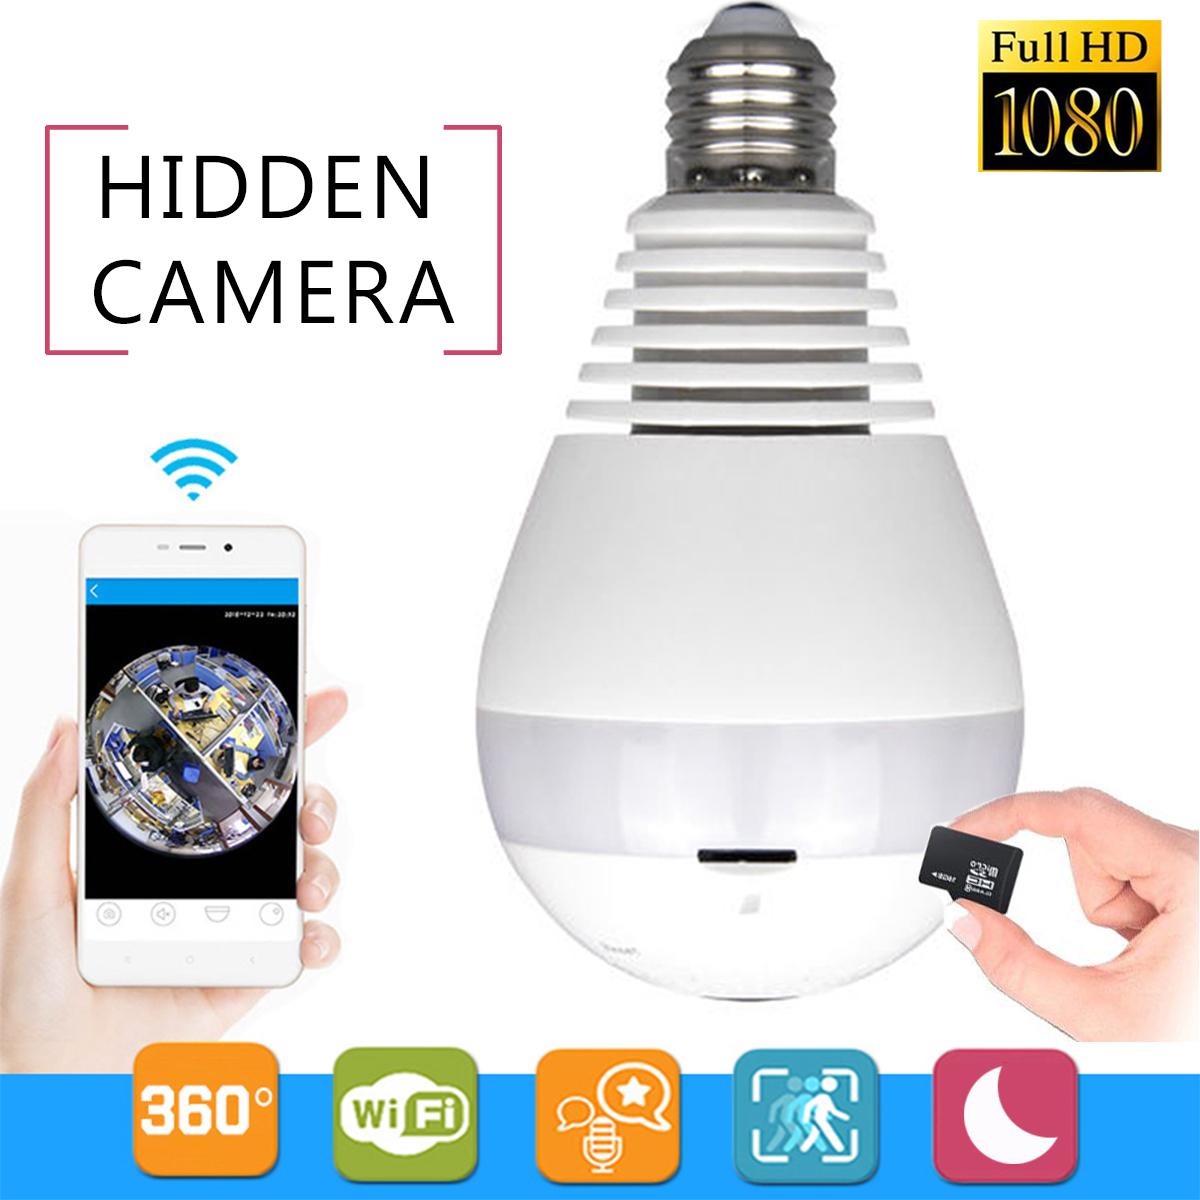 Grtsunsea 1080P HD 360° Panoramic Hidden Fish Eye Camera LED Light Bulb Camera Wifi App Control